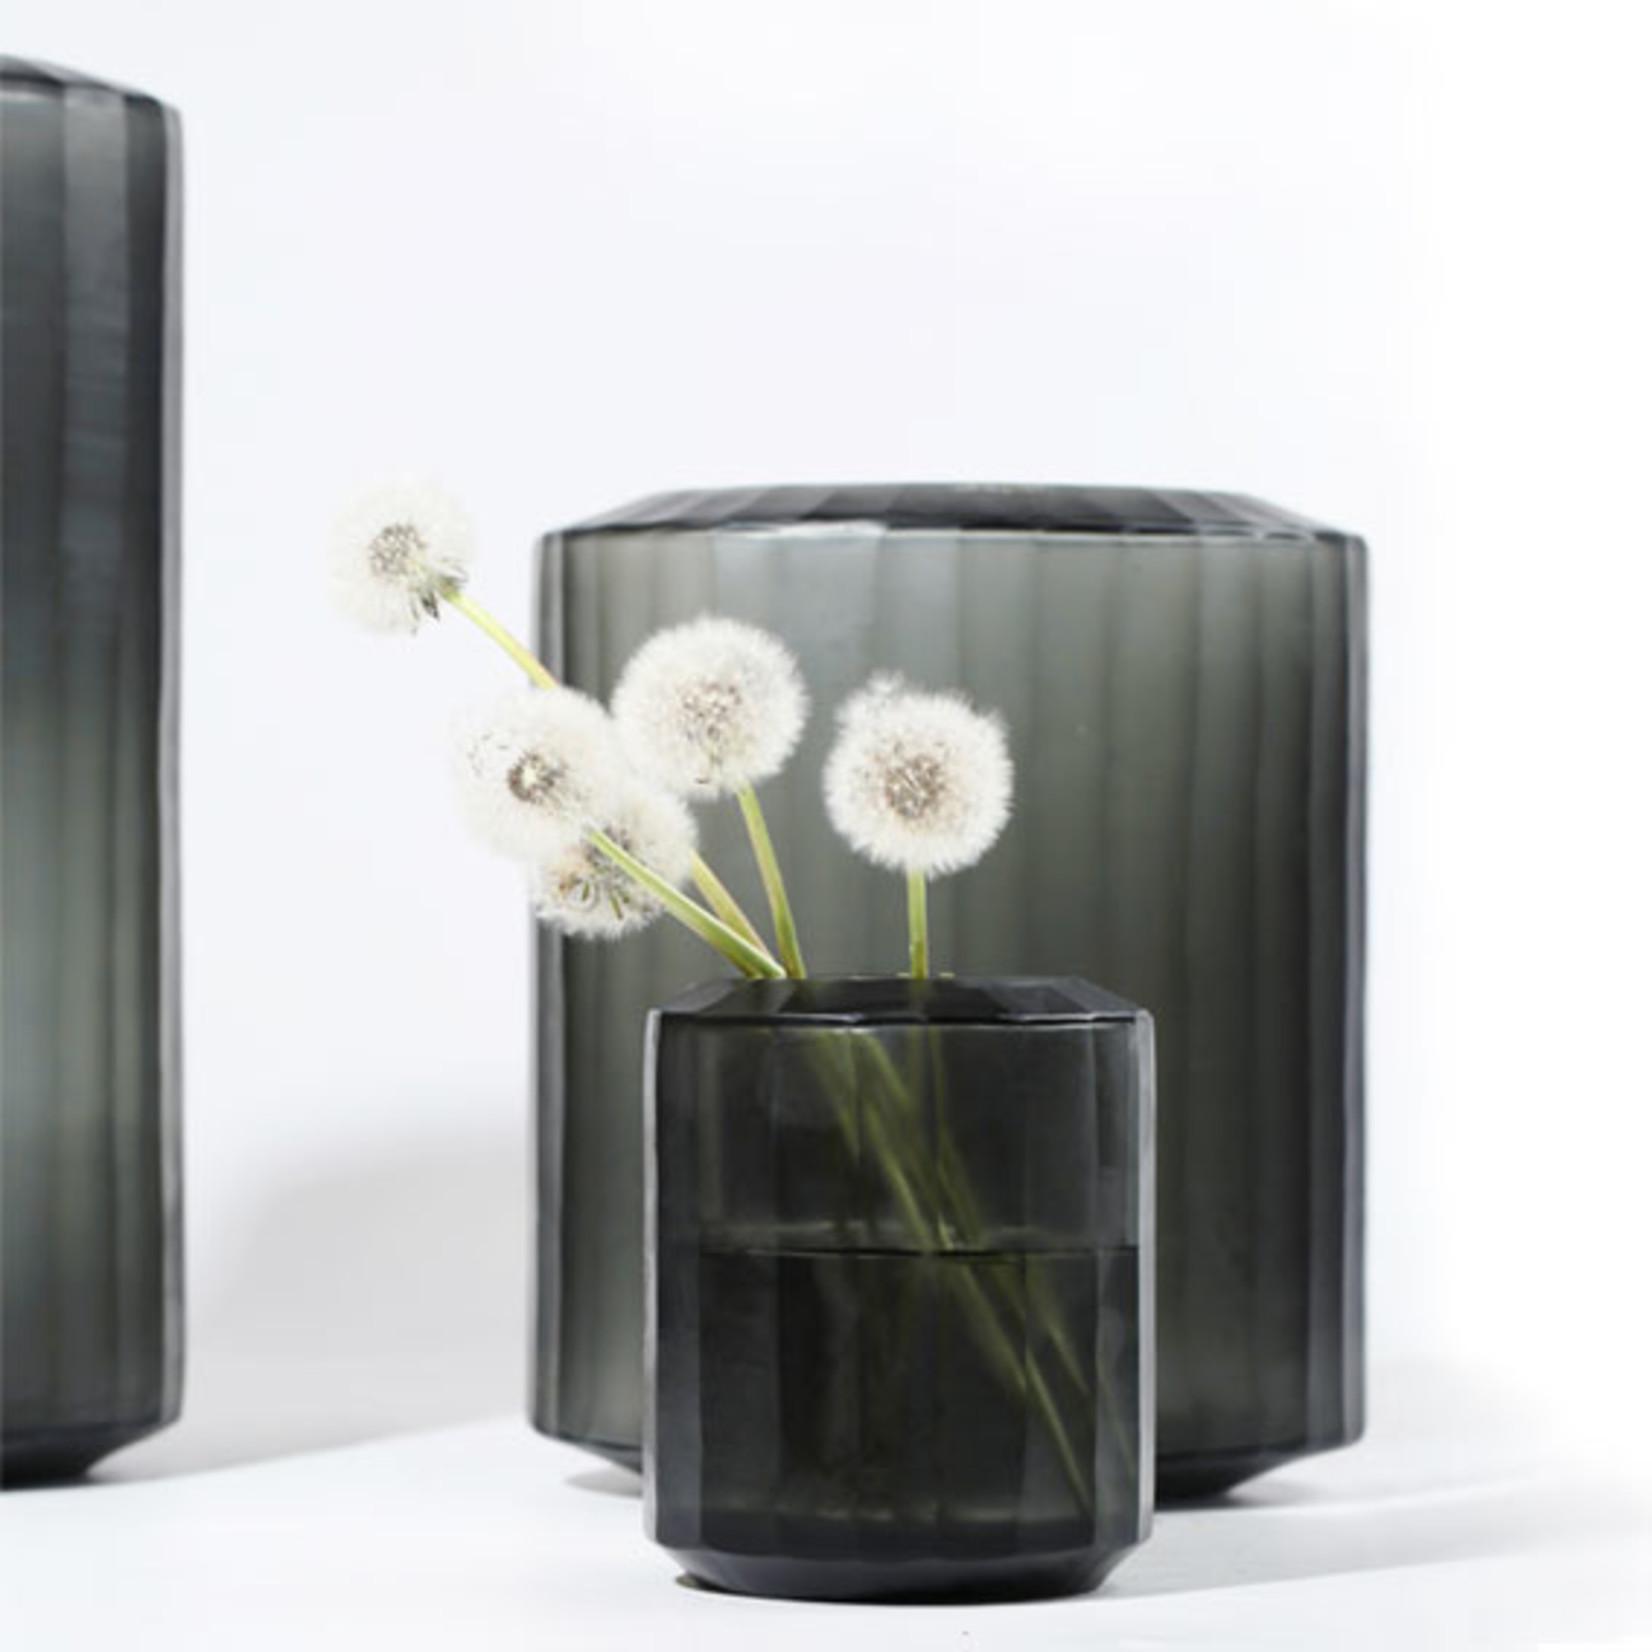 Guaxs Vase Omar L | Indigo / Smoke Gray